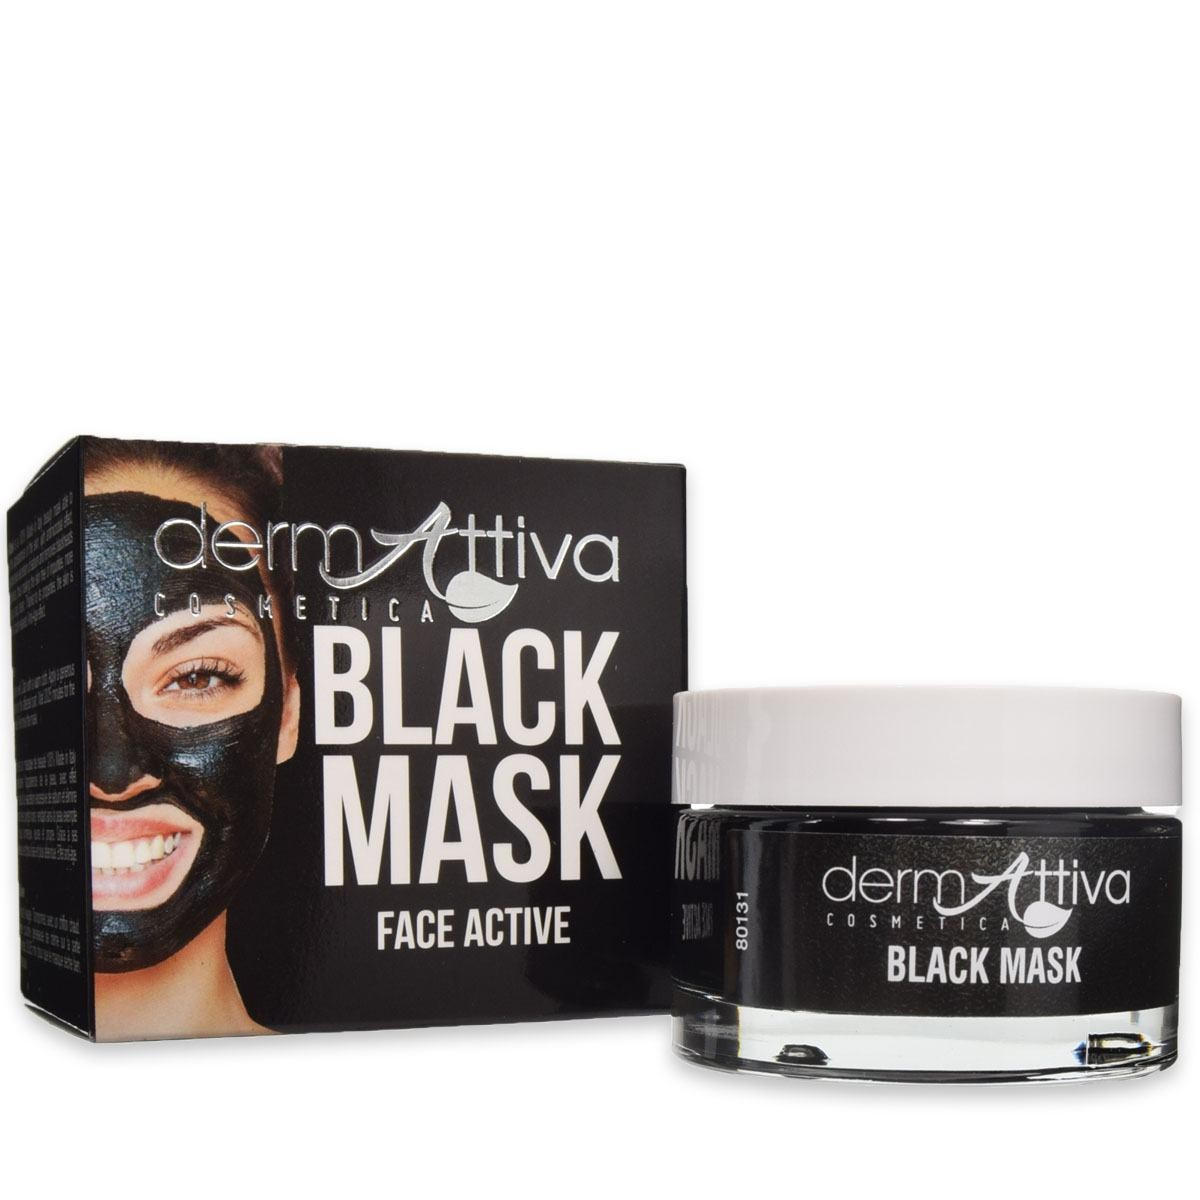 Dermattiva Black Mask Face Active 50ml